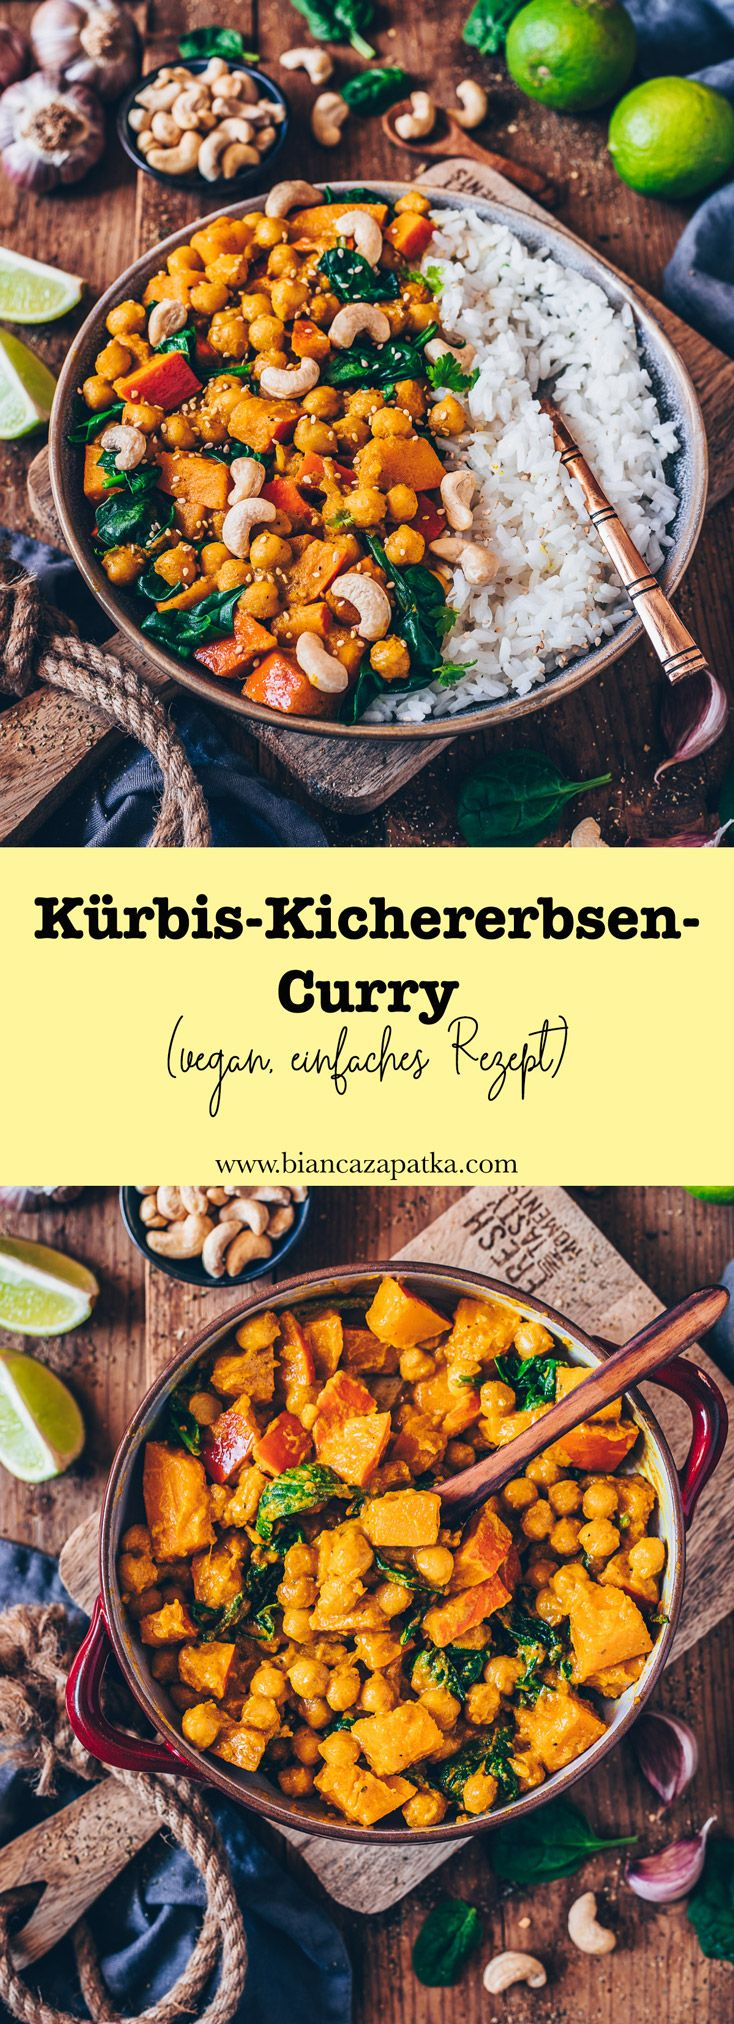 Kürbis-Kichererbsen-Curry (vegan, einfaches Rezept